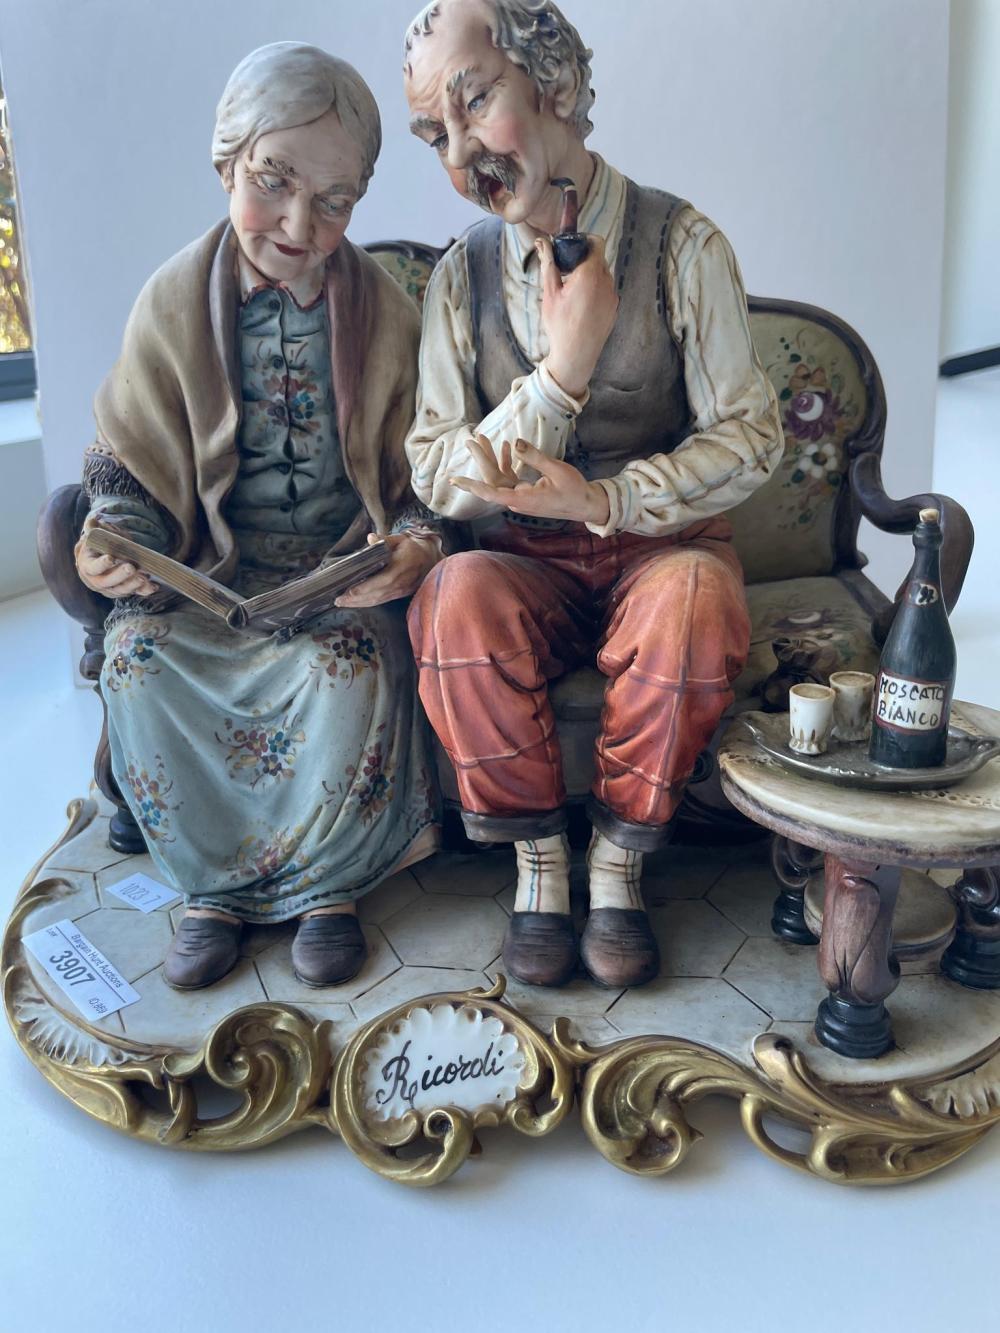 Italian Triade Benacchio porcelain figural group. 24 x 28 cm. (9.45 x 11.02 in.)